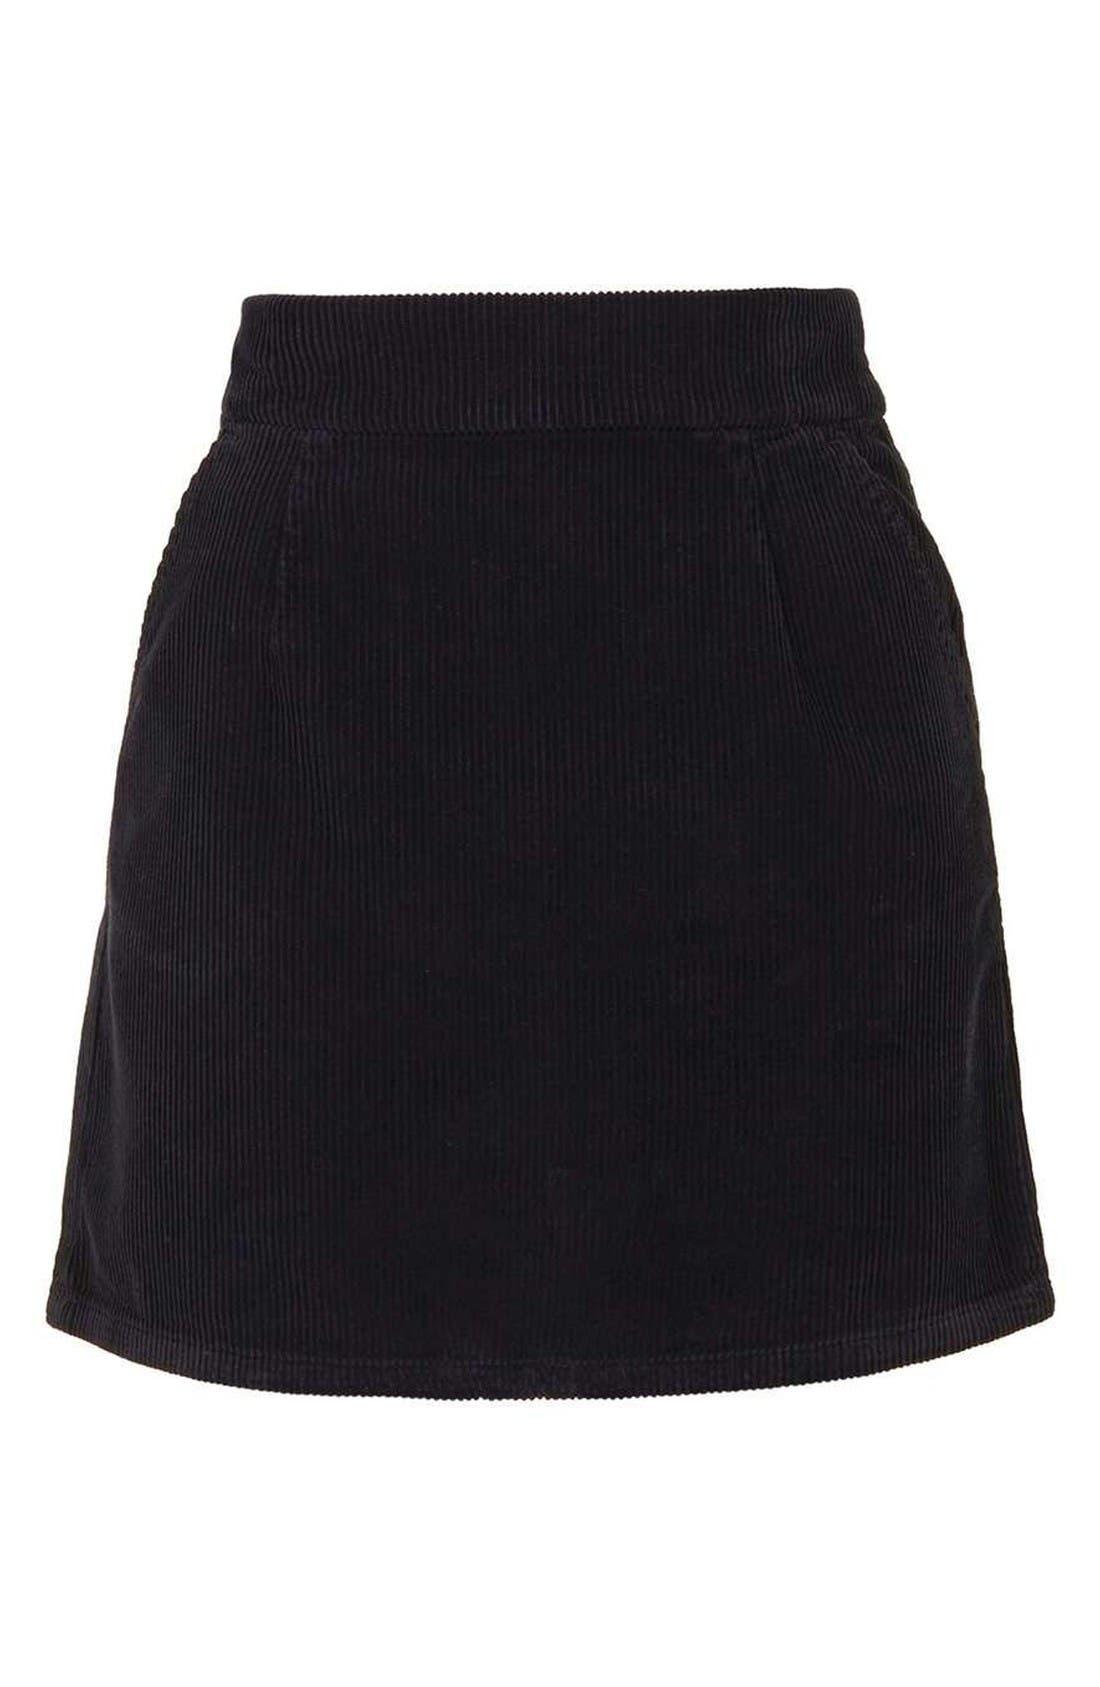 Alternate Image 4  - Topshop Corduroy Miniskirt